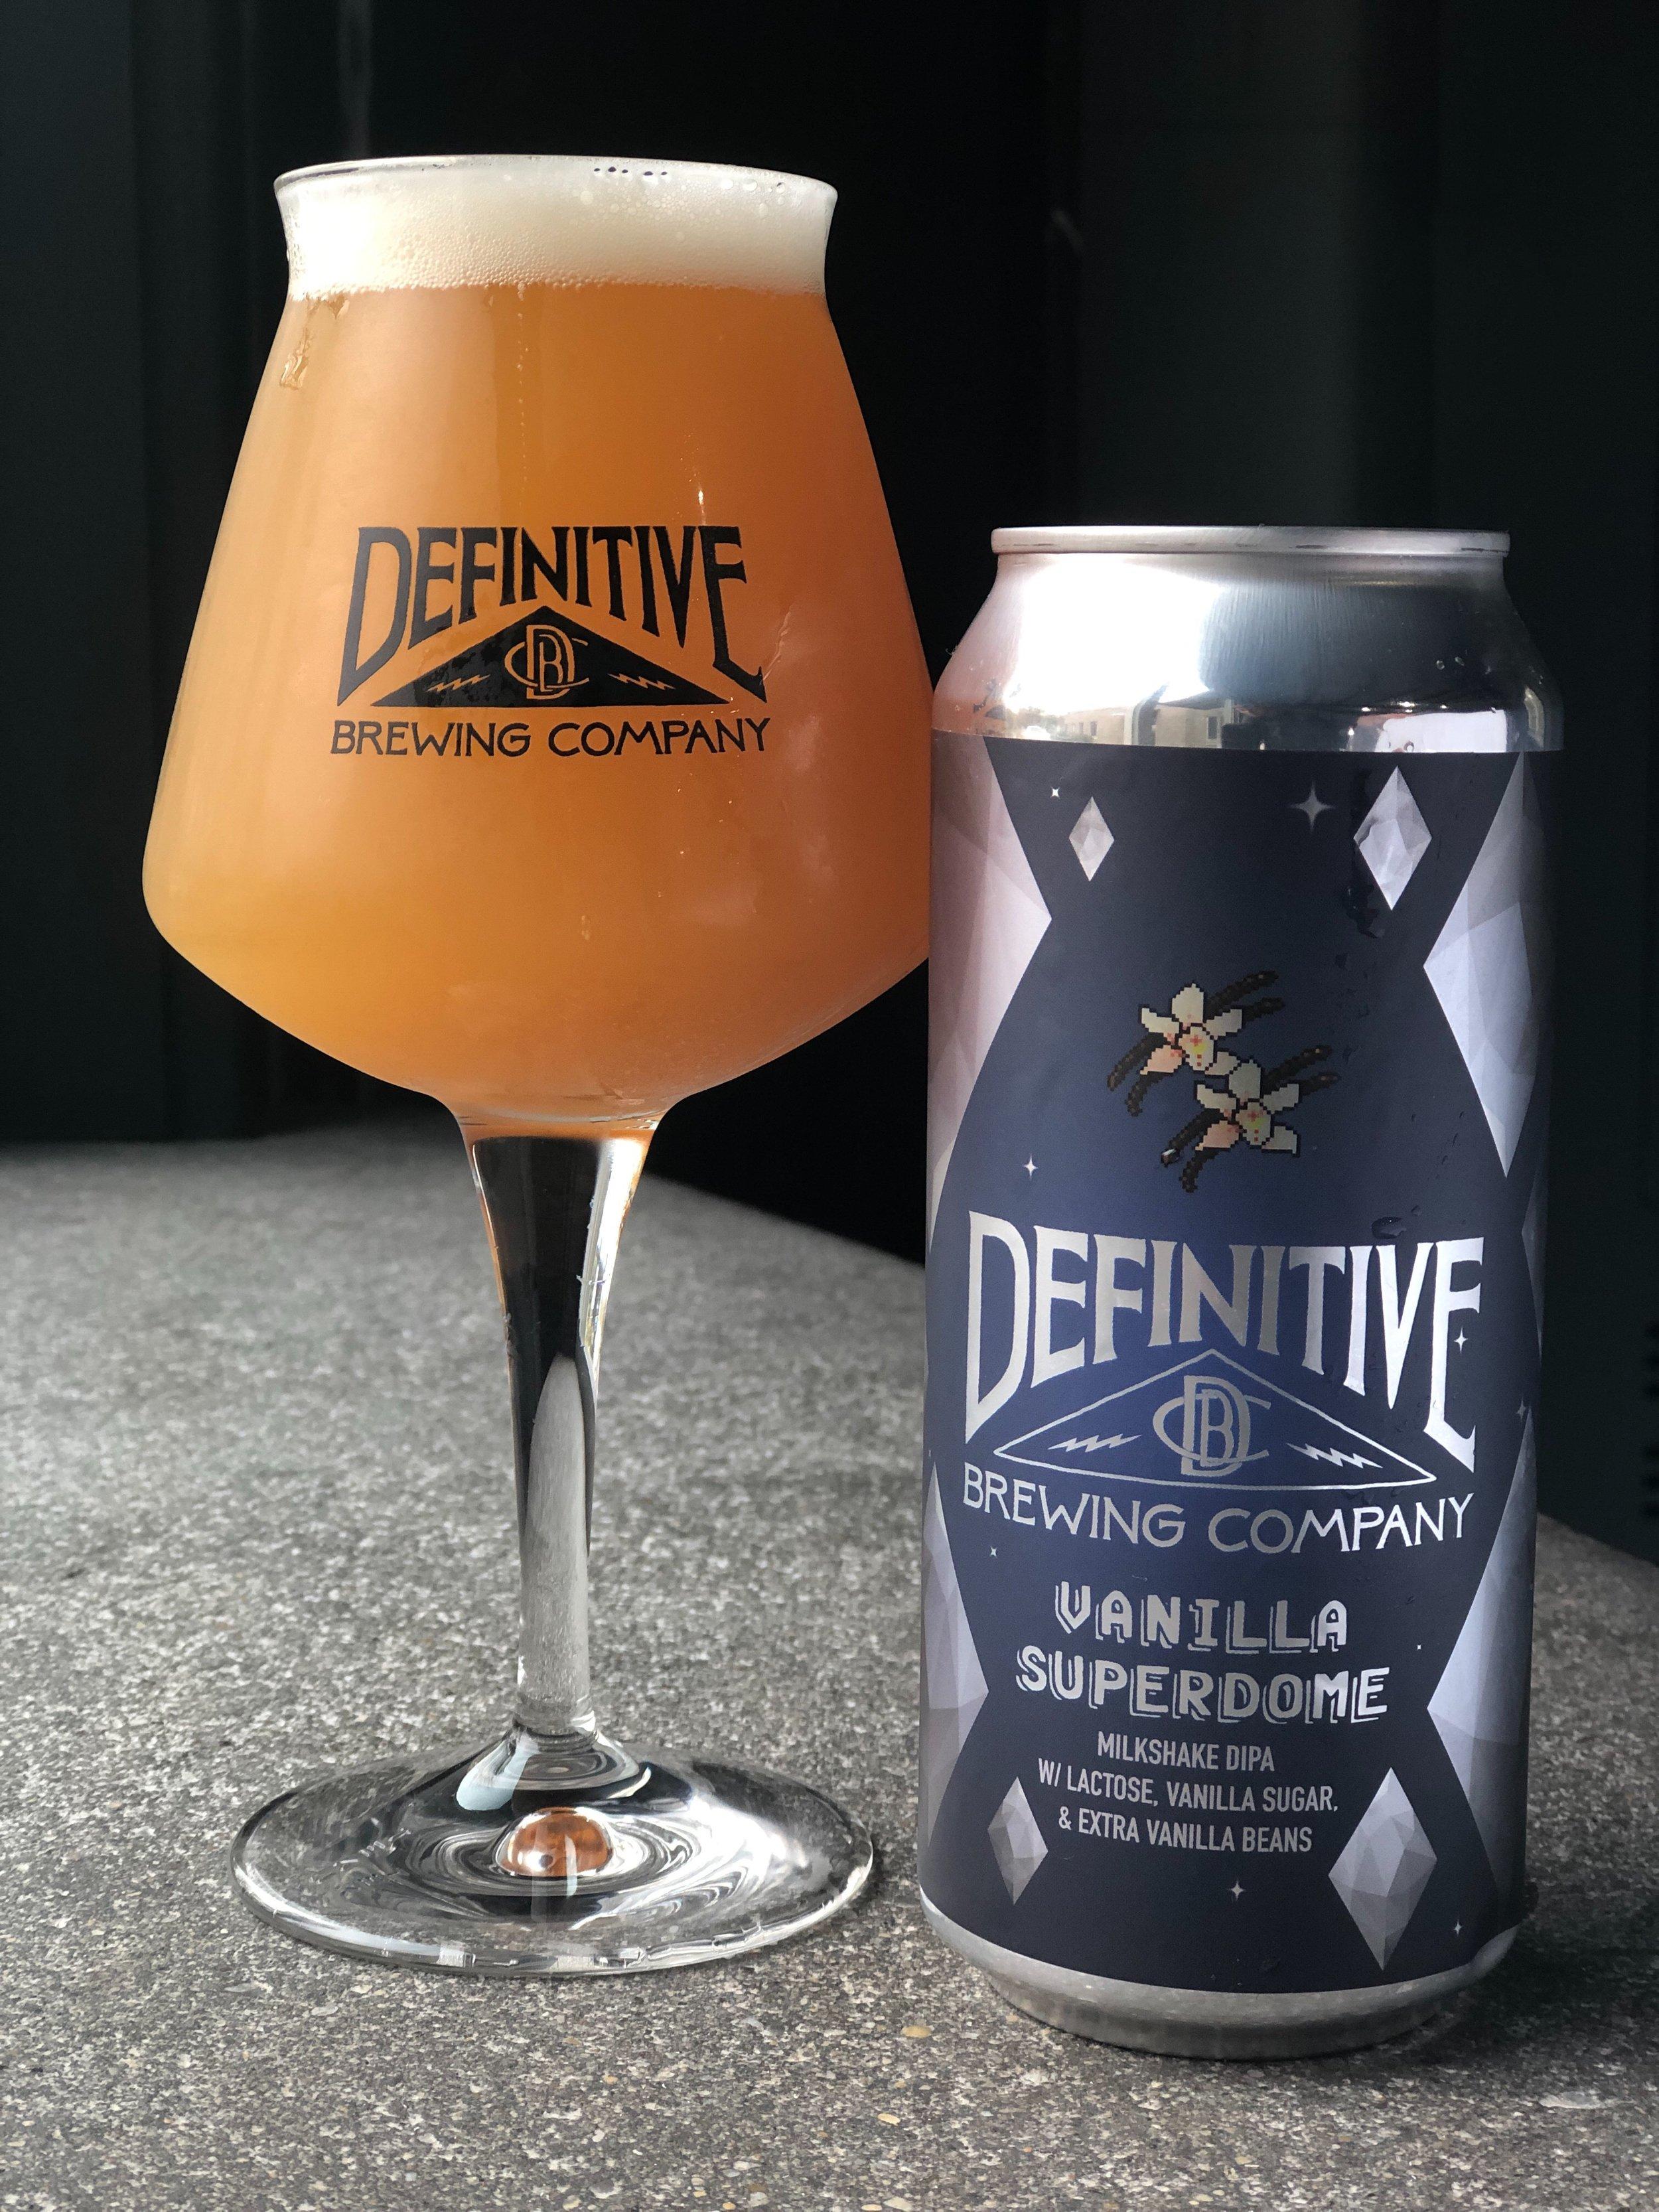 Vanilla Superdome - Milkshake DIPA